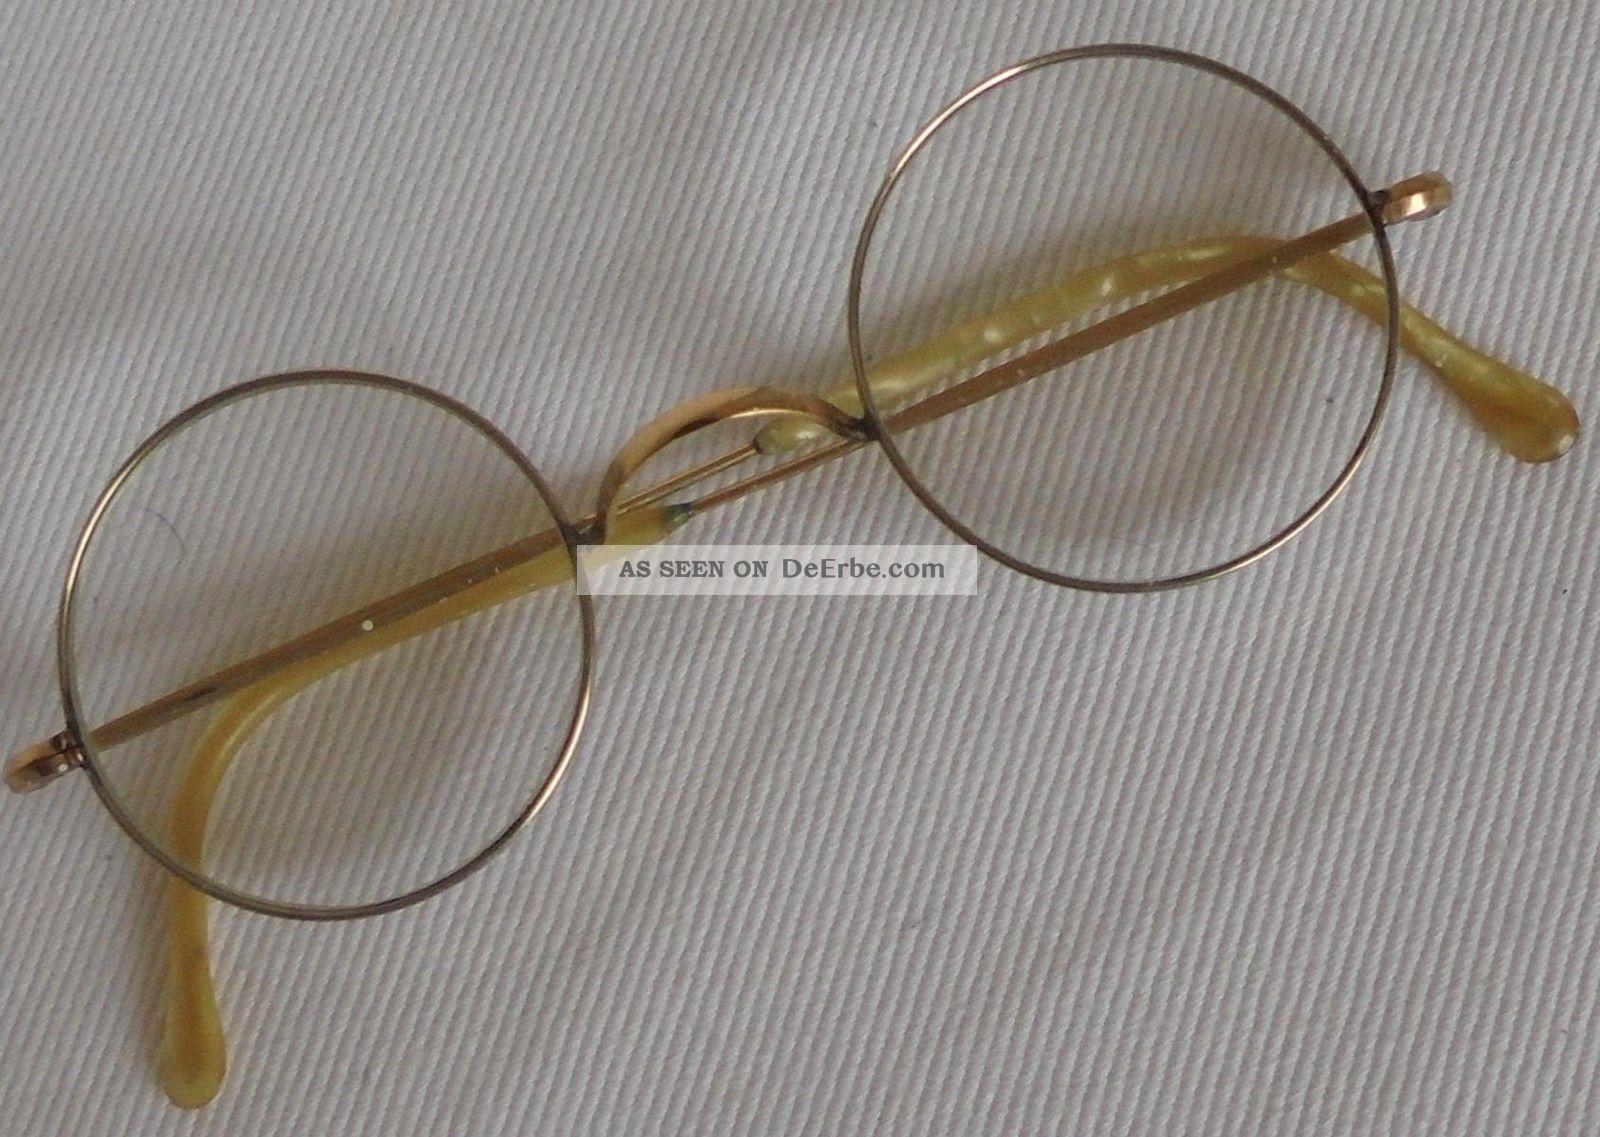 Antike Brille Accessoires Bild